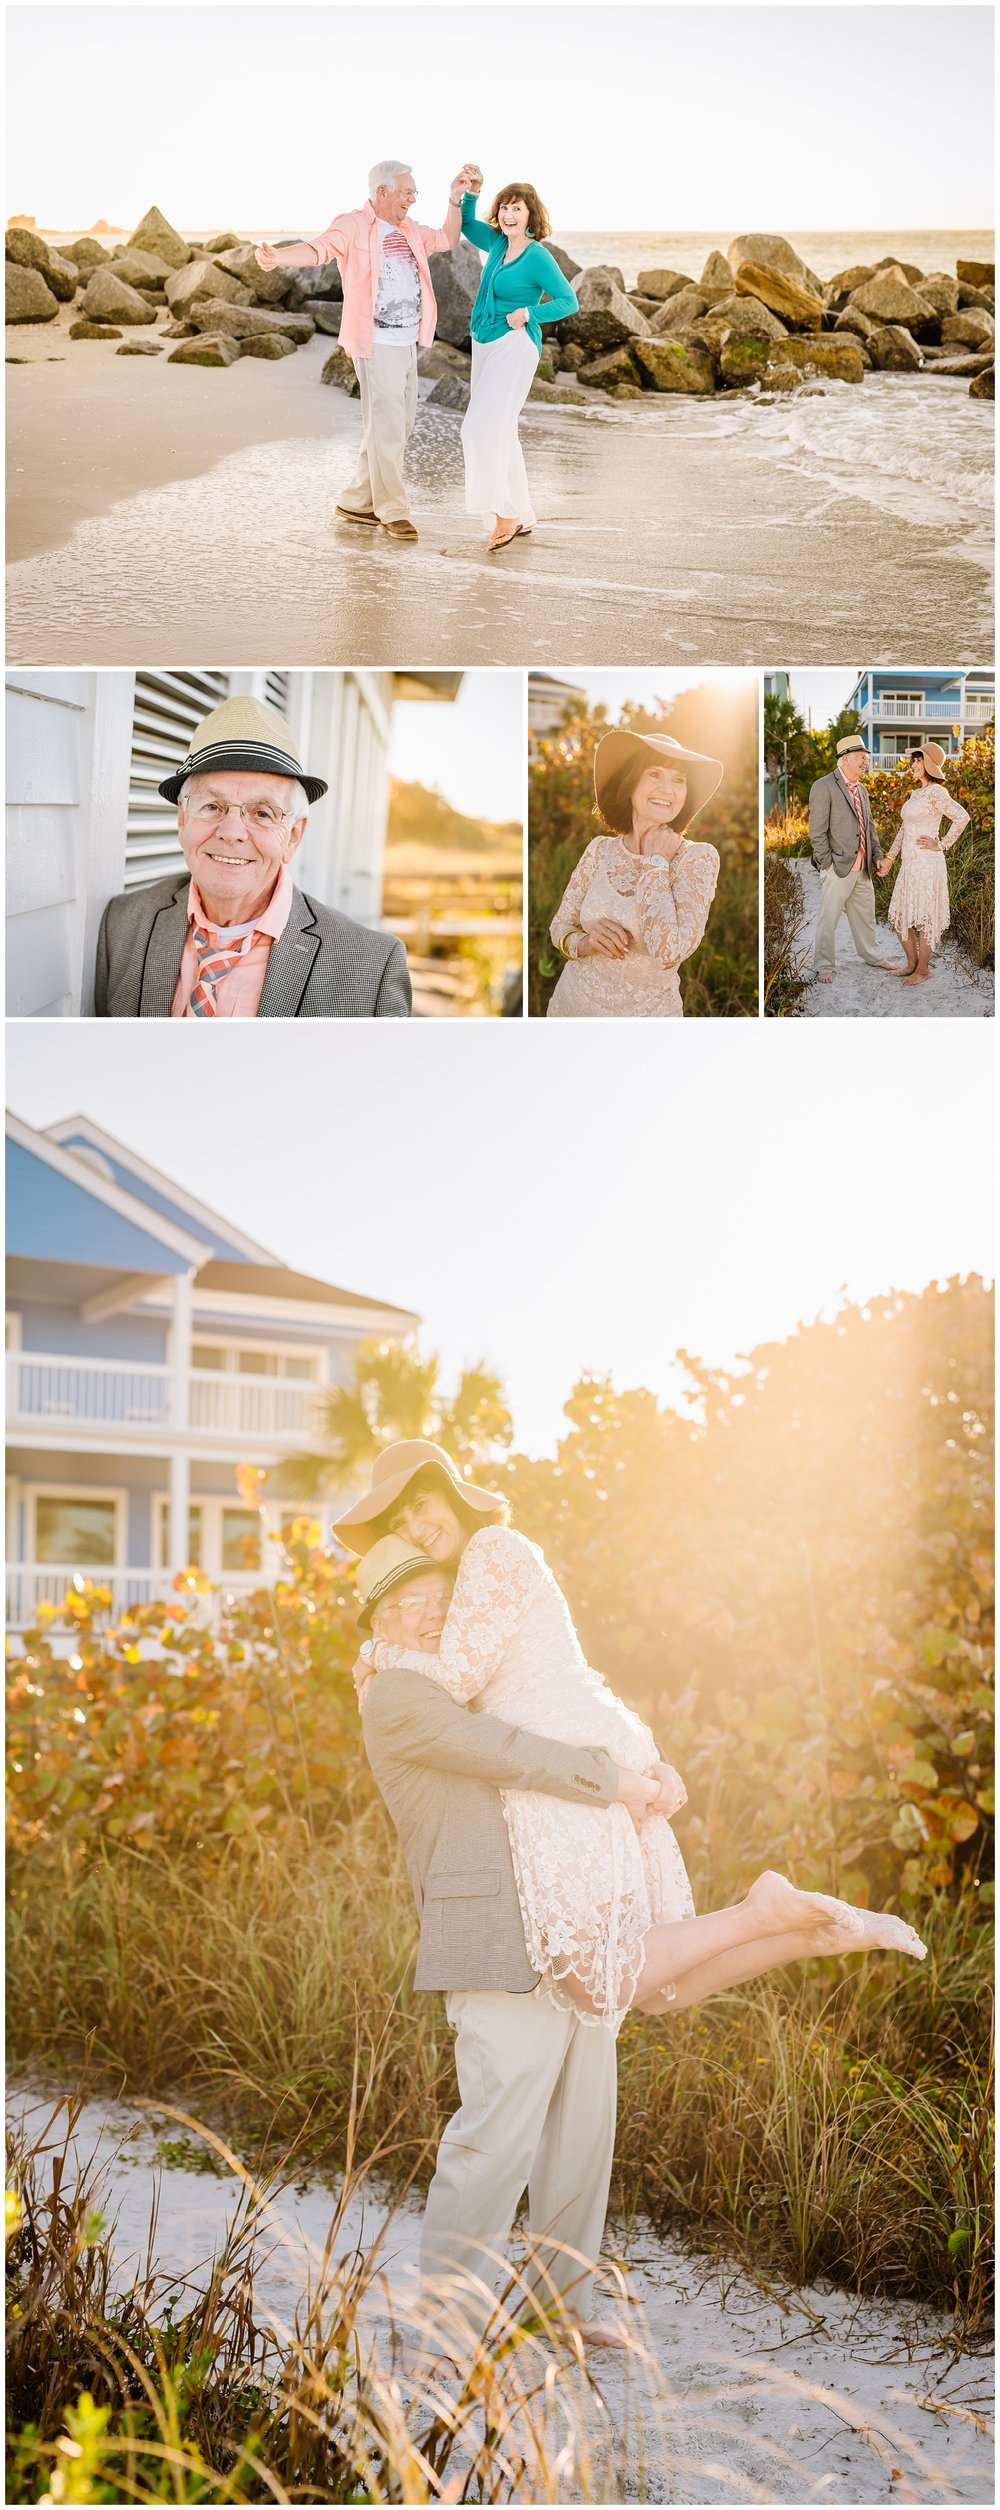 Ashlee-hamon-photography-year-in-review-2016-travel-wanderlust-vsco-adventure-wedding_0009.jpg